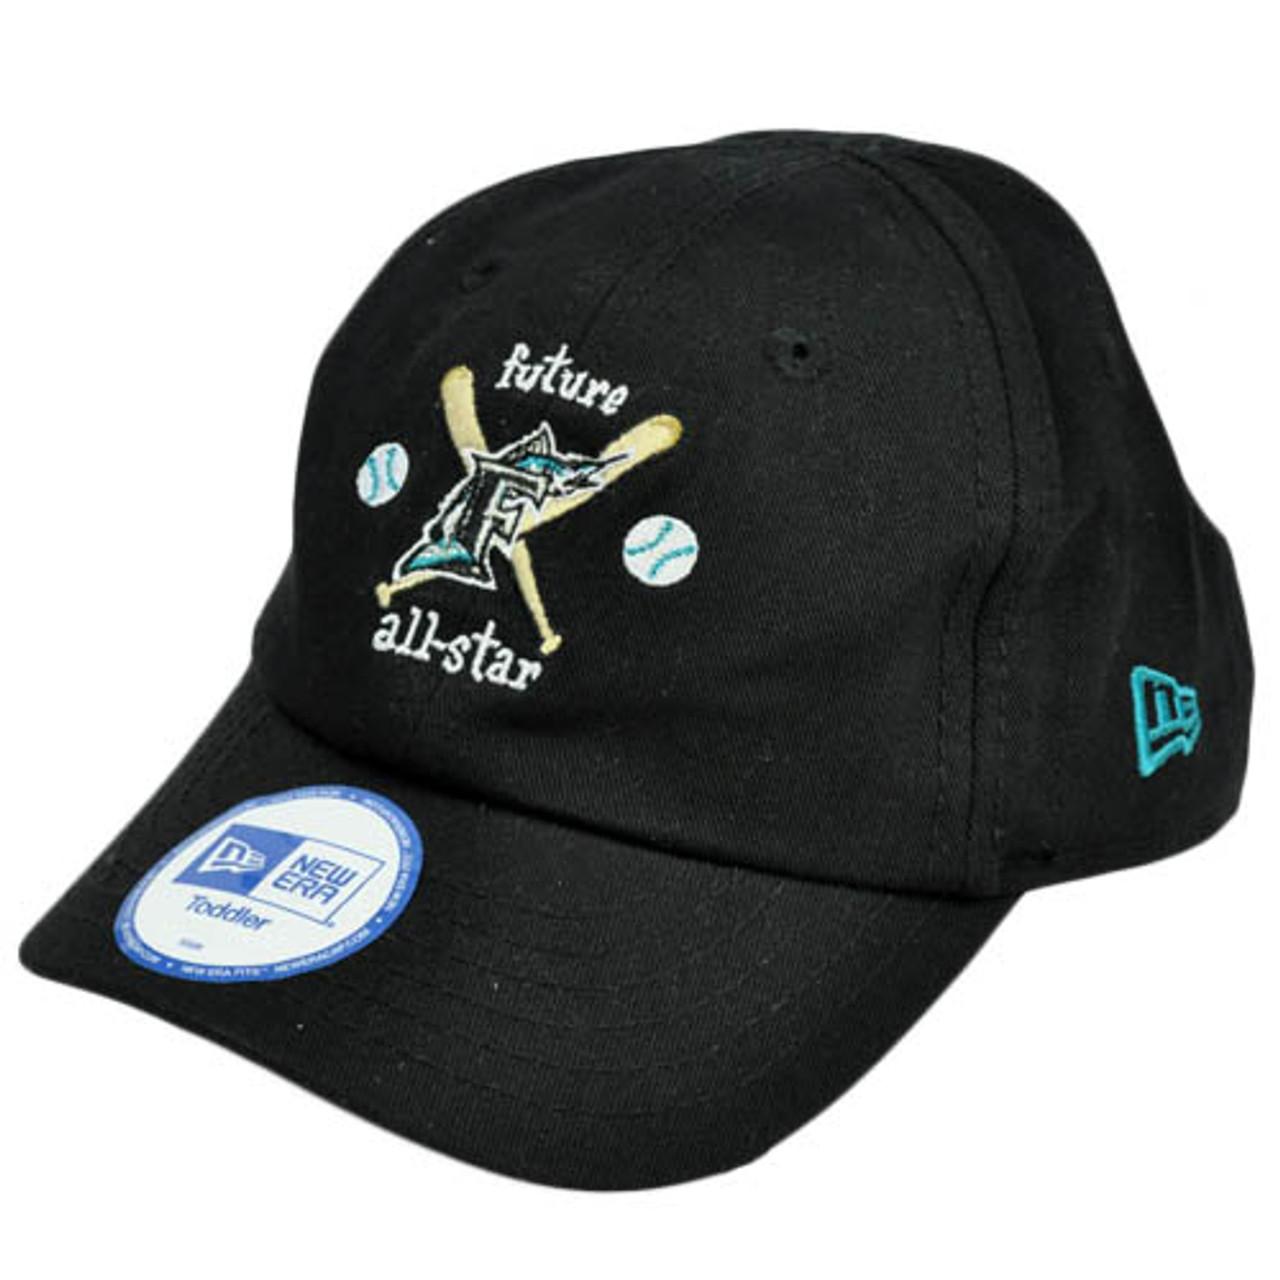 MLB Florida Marlins Future All Star Youth Toddler Baby Boy Stretch Black  Hat Cap 8cf7258f7851